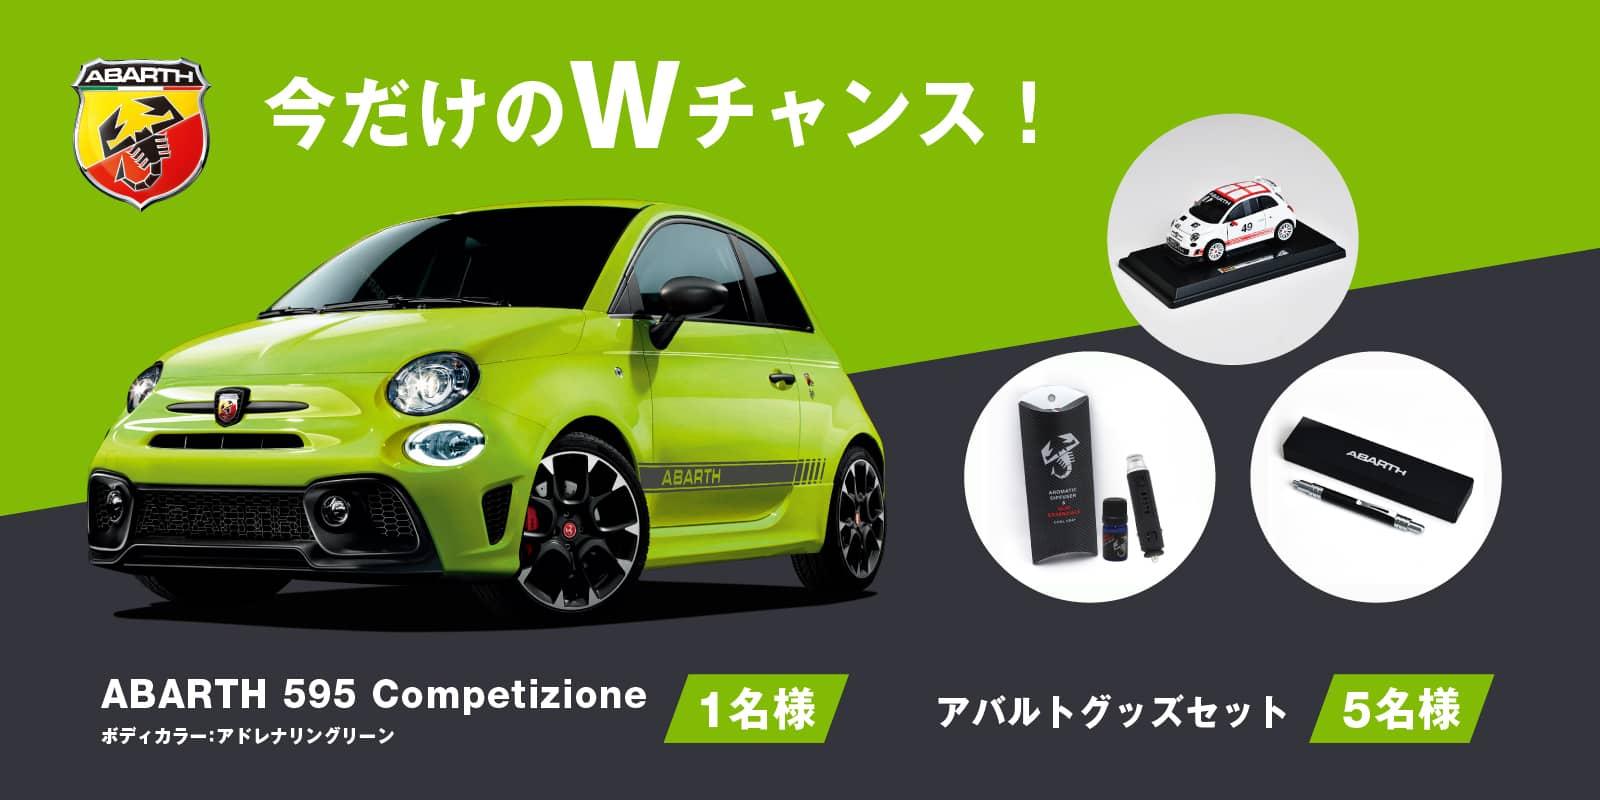 『ABARTH 595 Competizione』 プレゼントキャンペーン